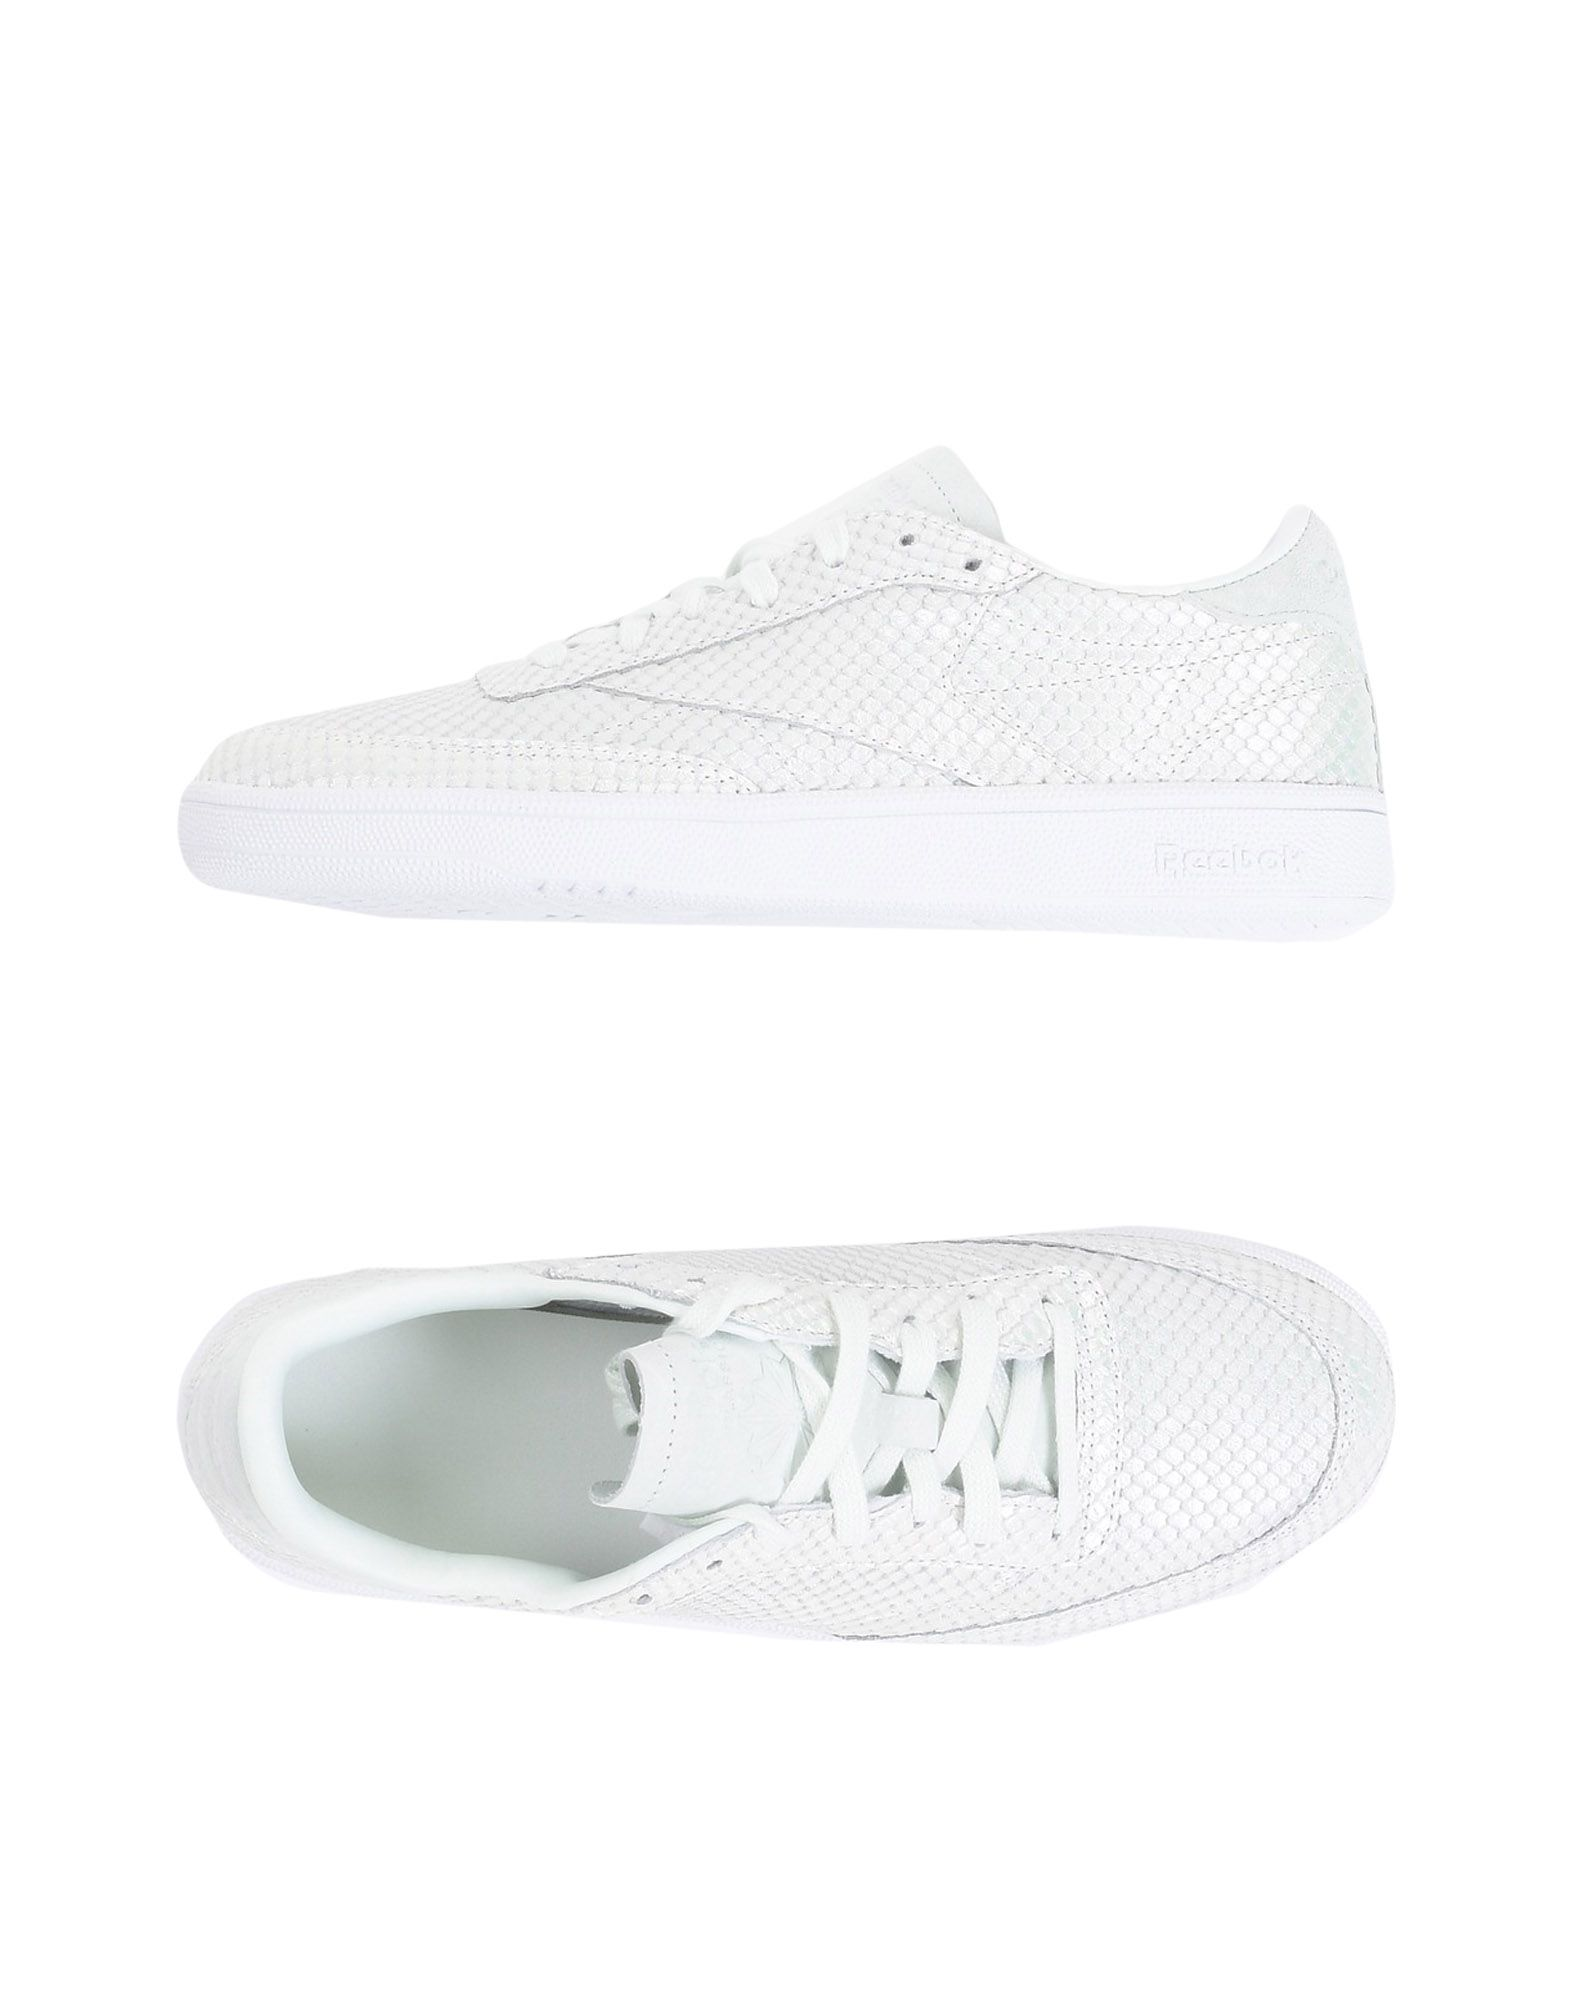 Sneakers Reebok Club C 85 Textural - Donna - 11443468DK